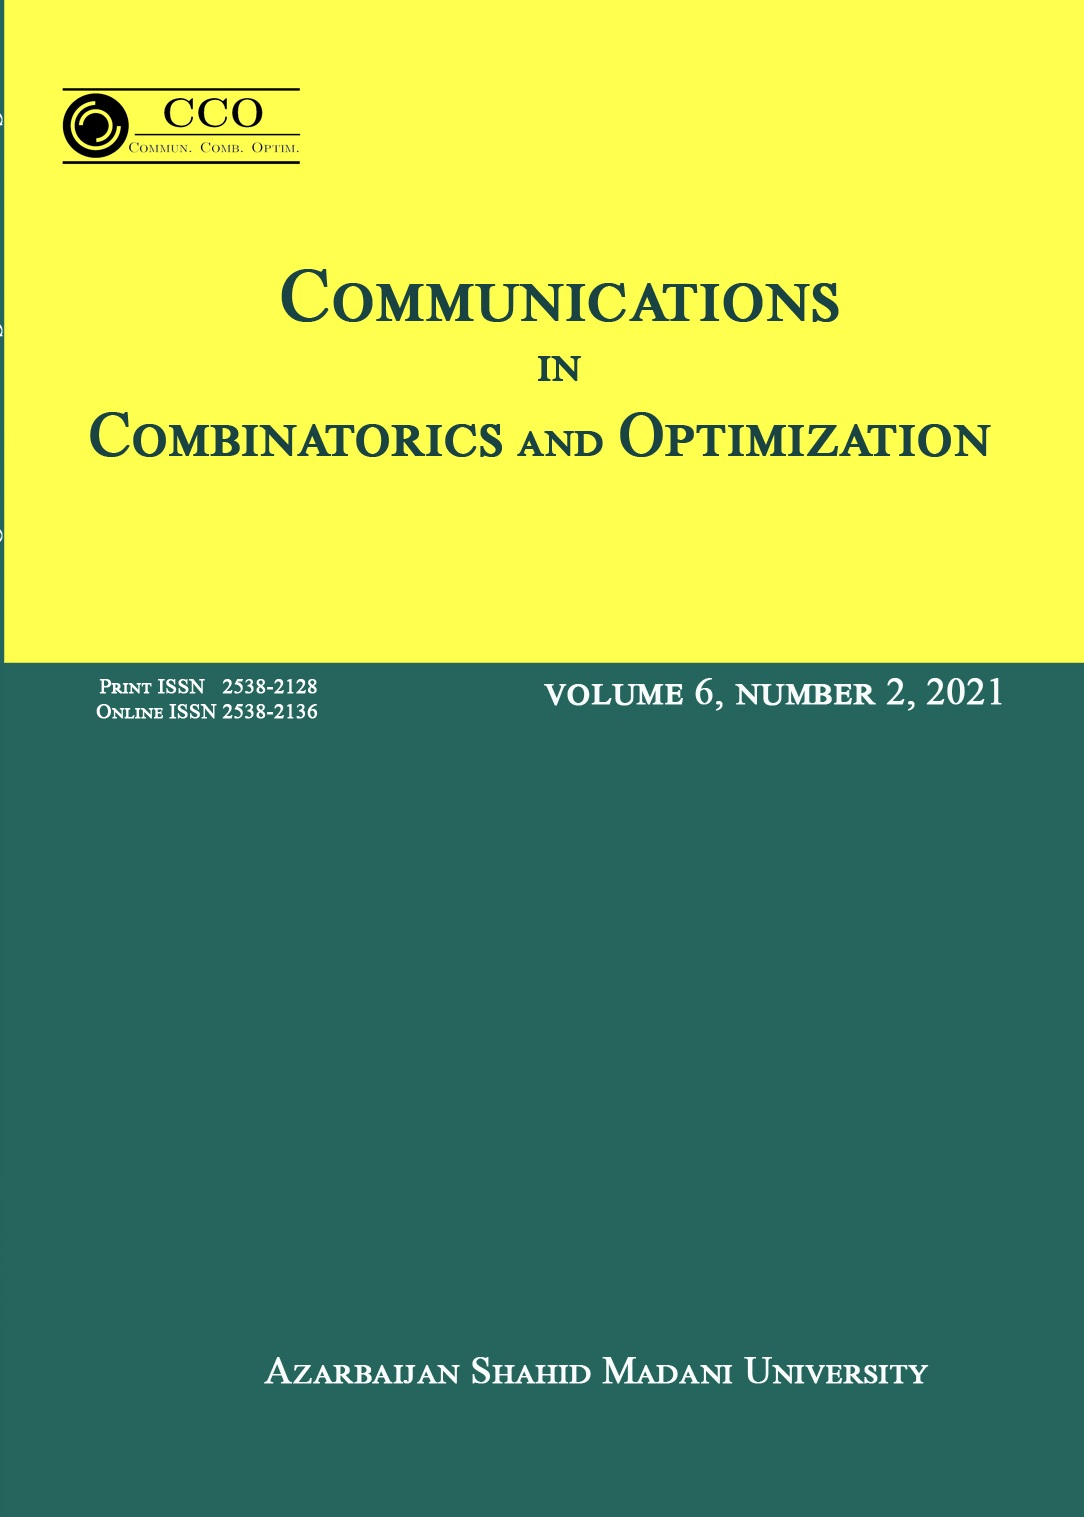 Communications in Combinatorics and Optimization